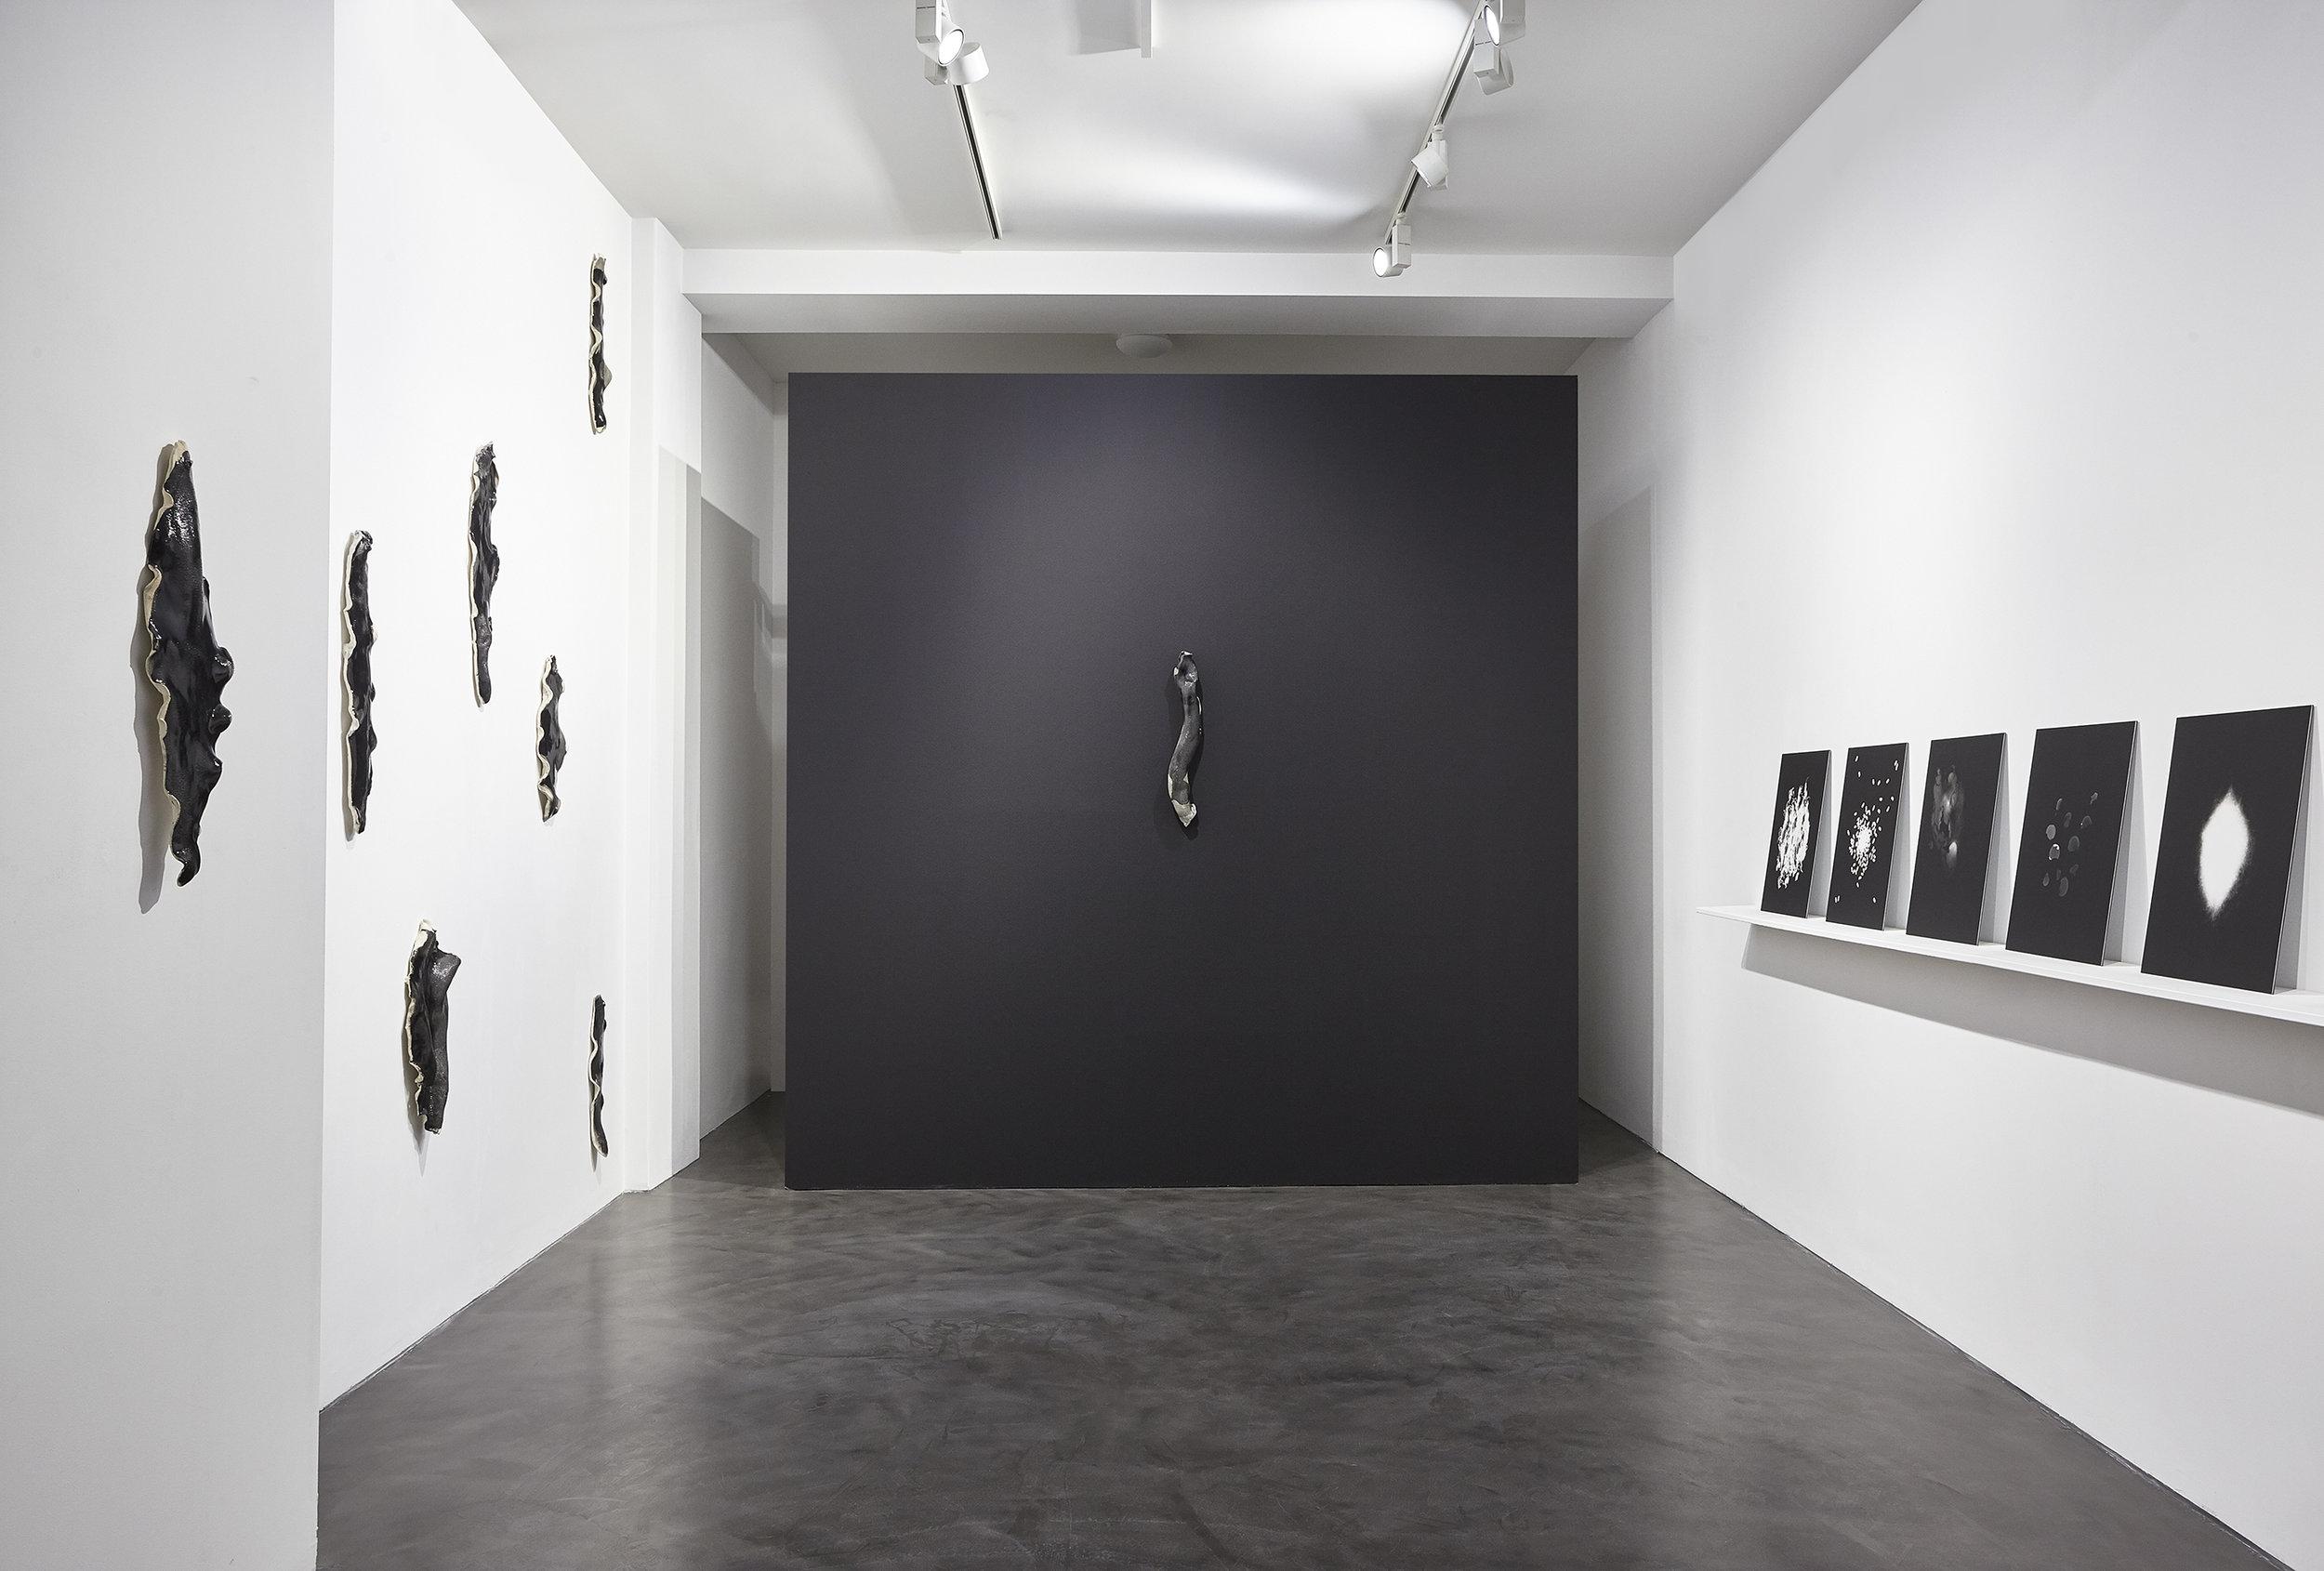 Installation view. Photo: Joseph Devitt